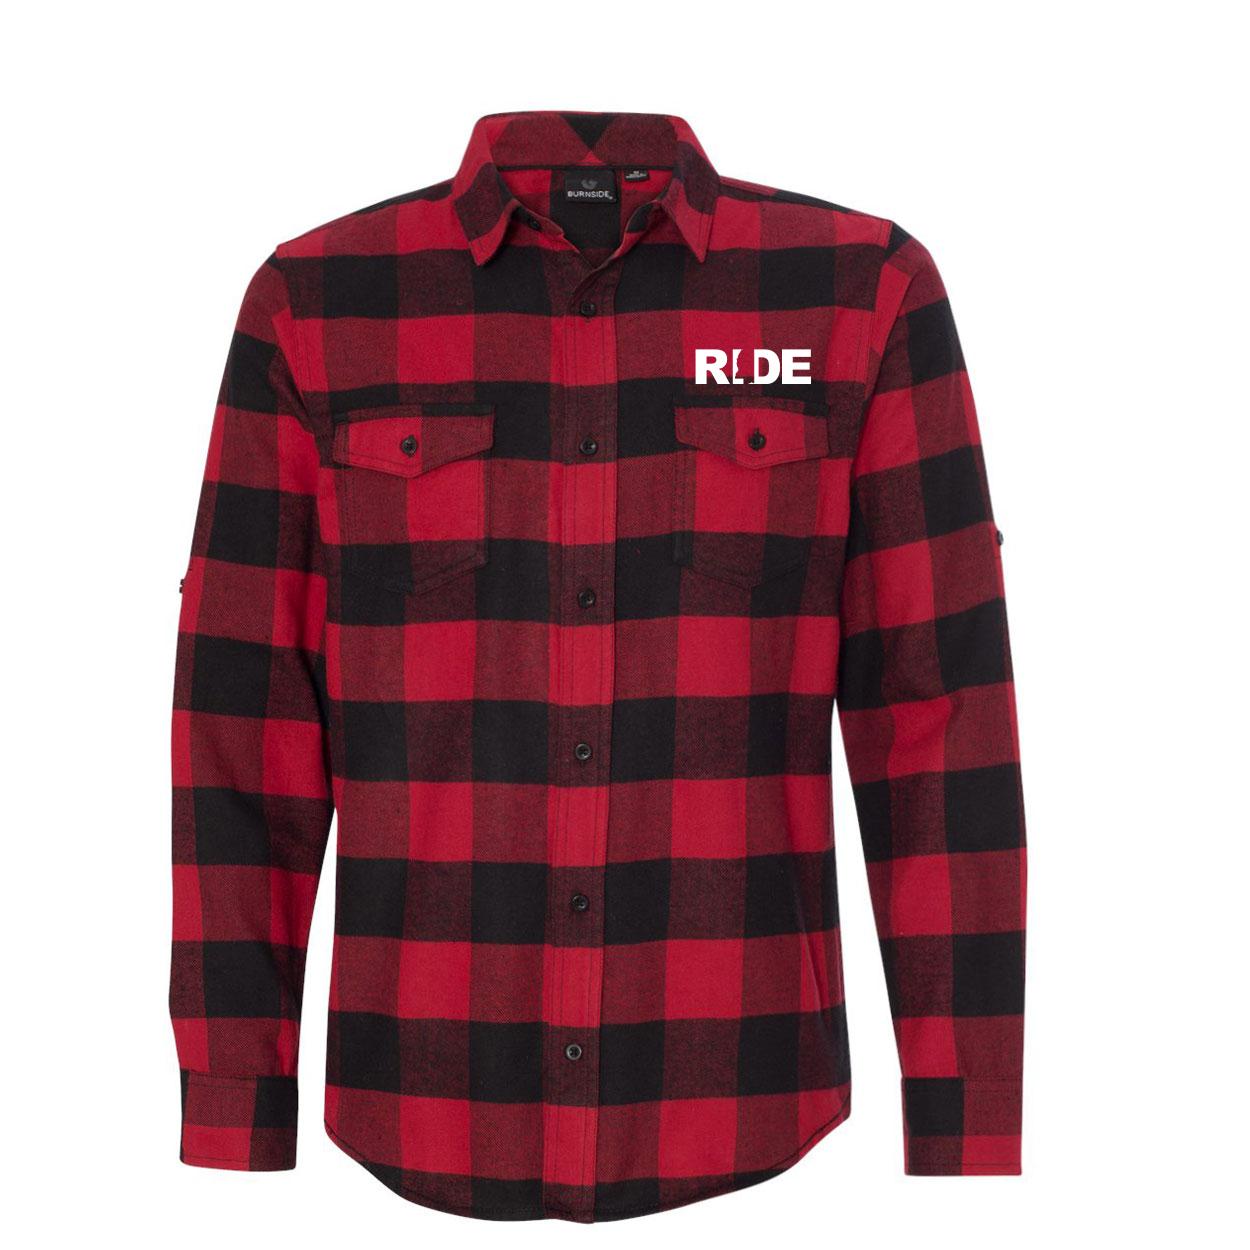 Ride Mississippi Classic Unisex Long Sleeve Flannel Shirt Red/Black Buffalo (White Logo)